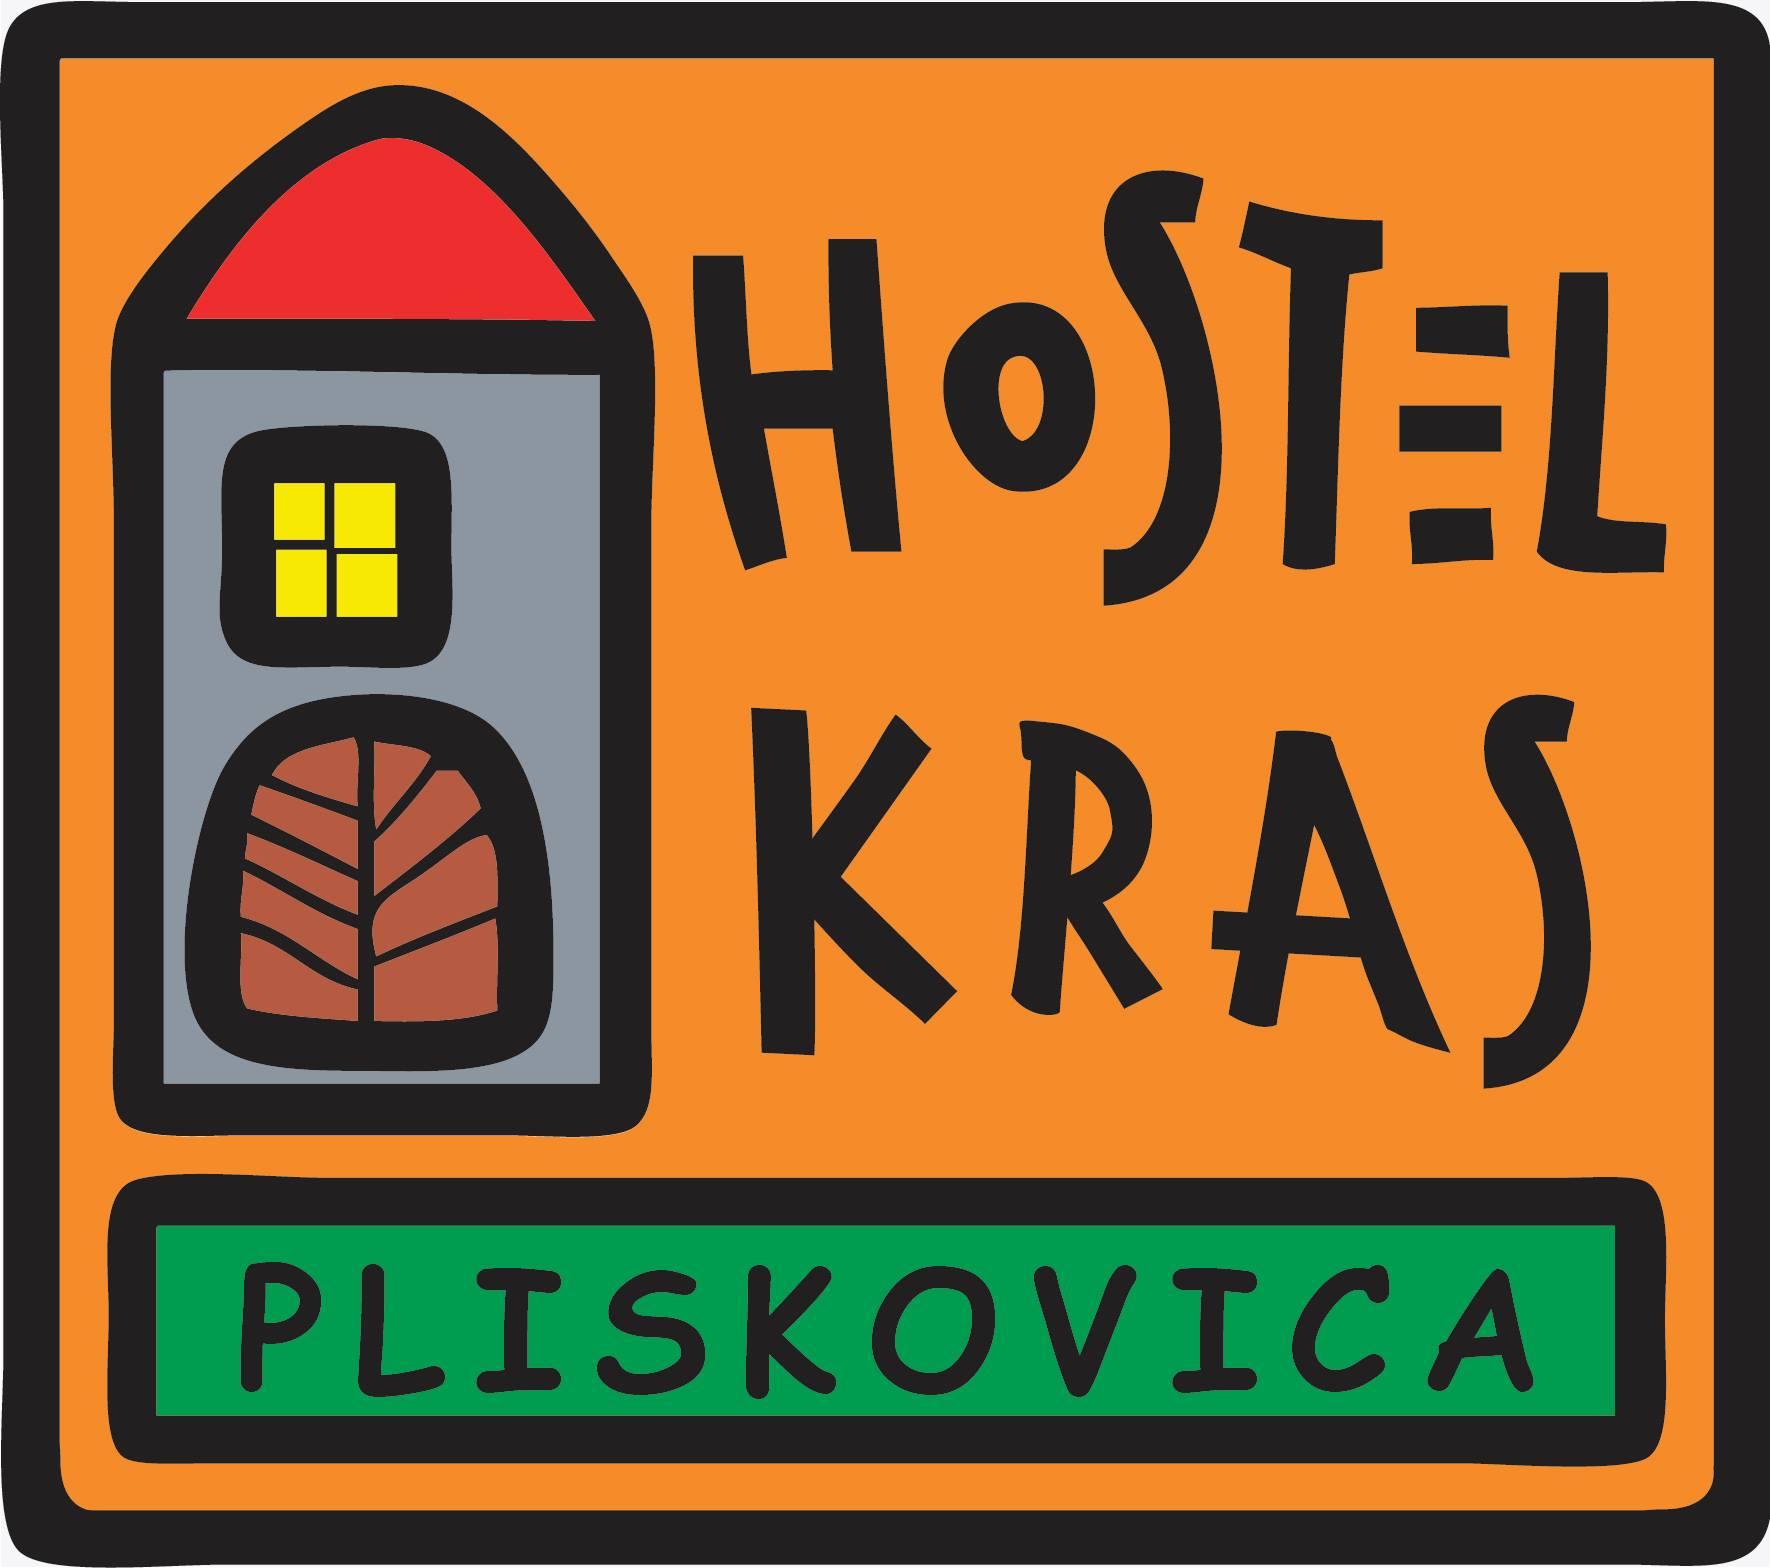 kras hostel pliskovica slovenija